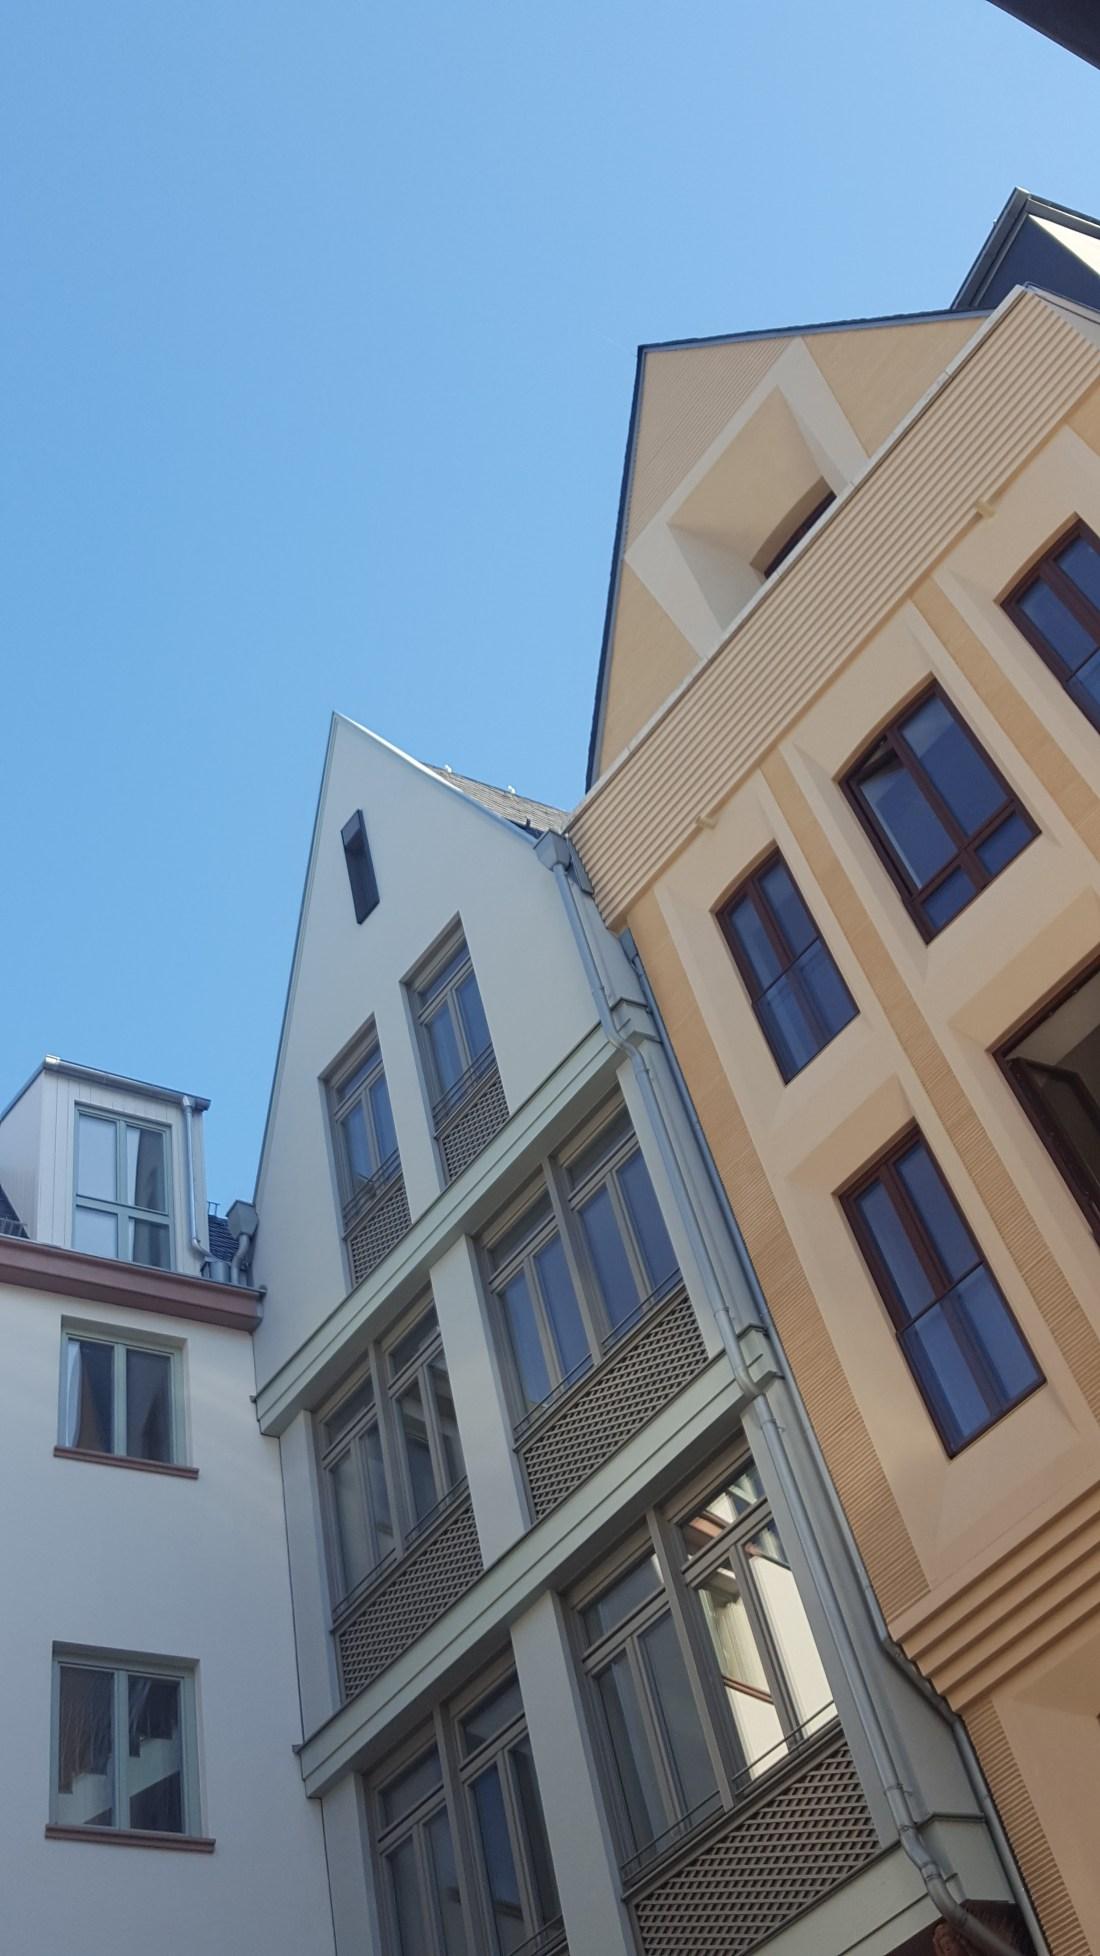 frankfurt_altstadt_blouson_bomber-jacke_casual-look_mode-blog_ue50_oceanblue-style (9)